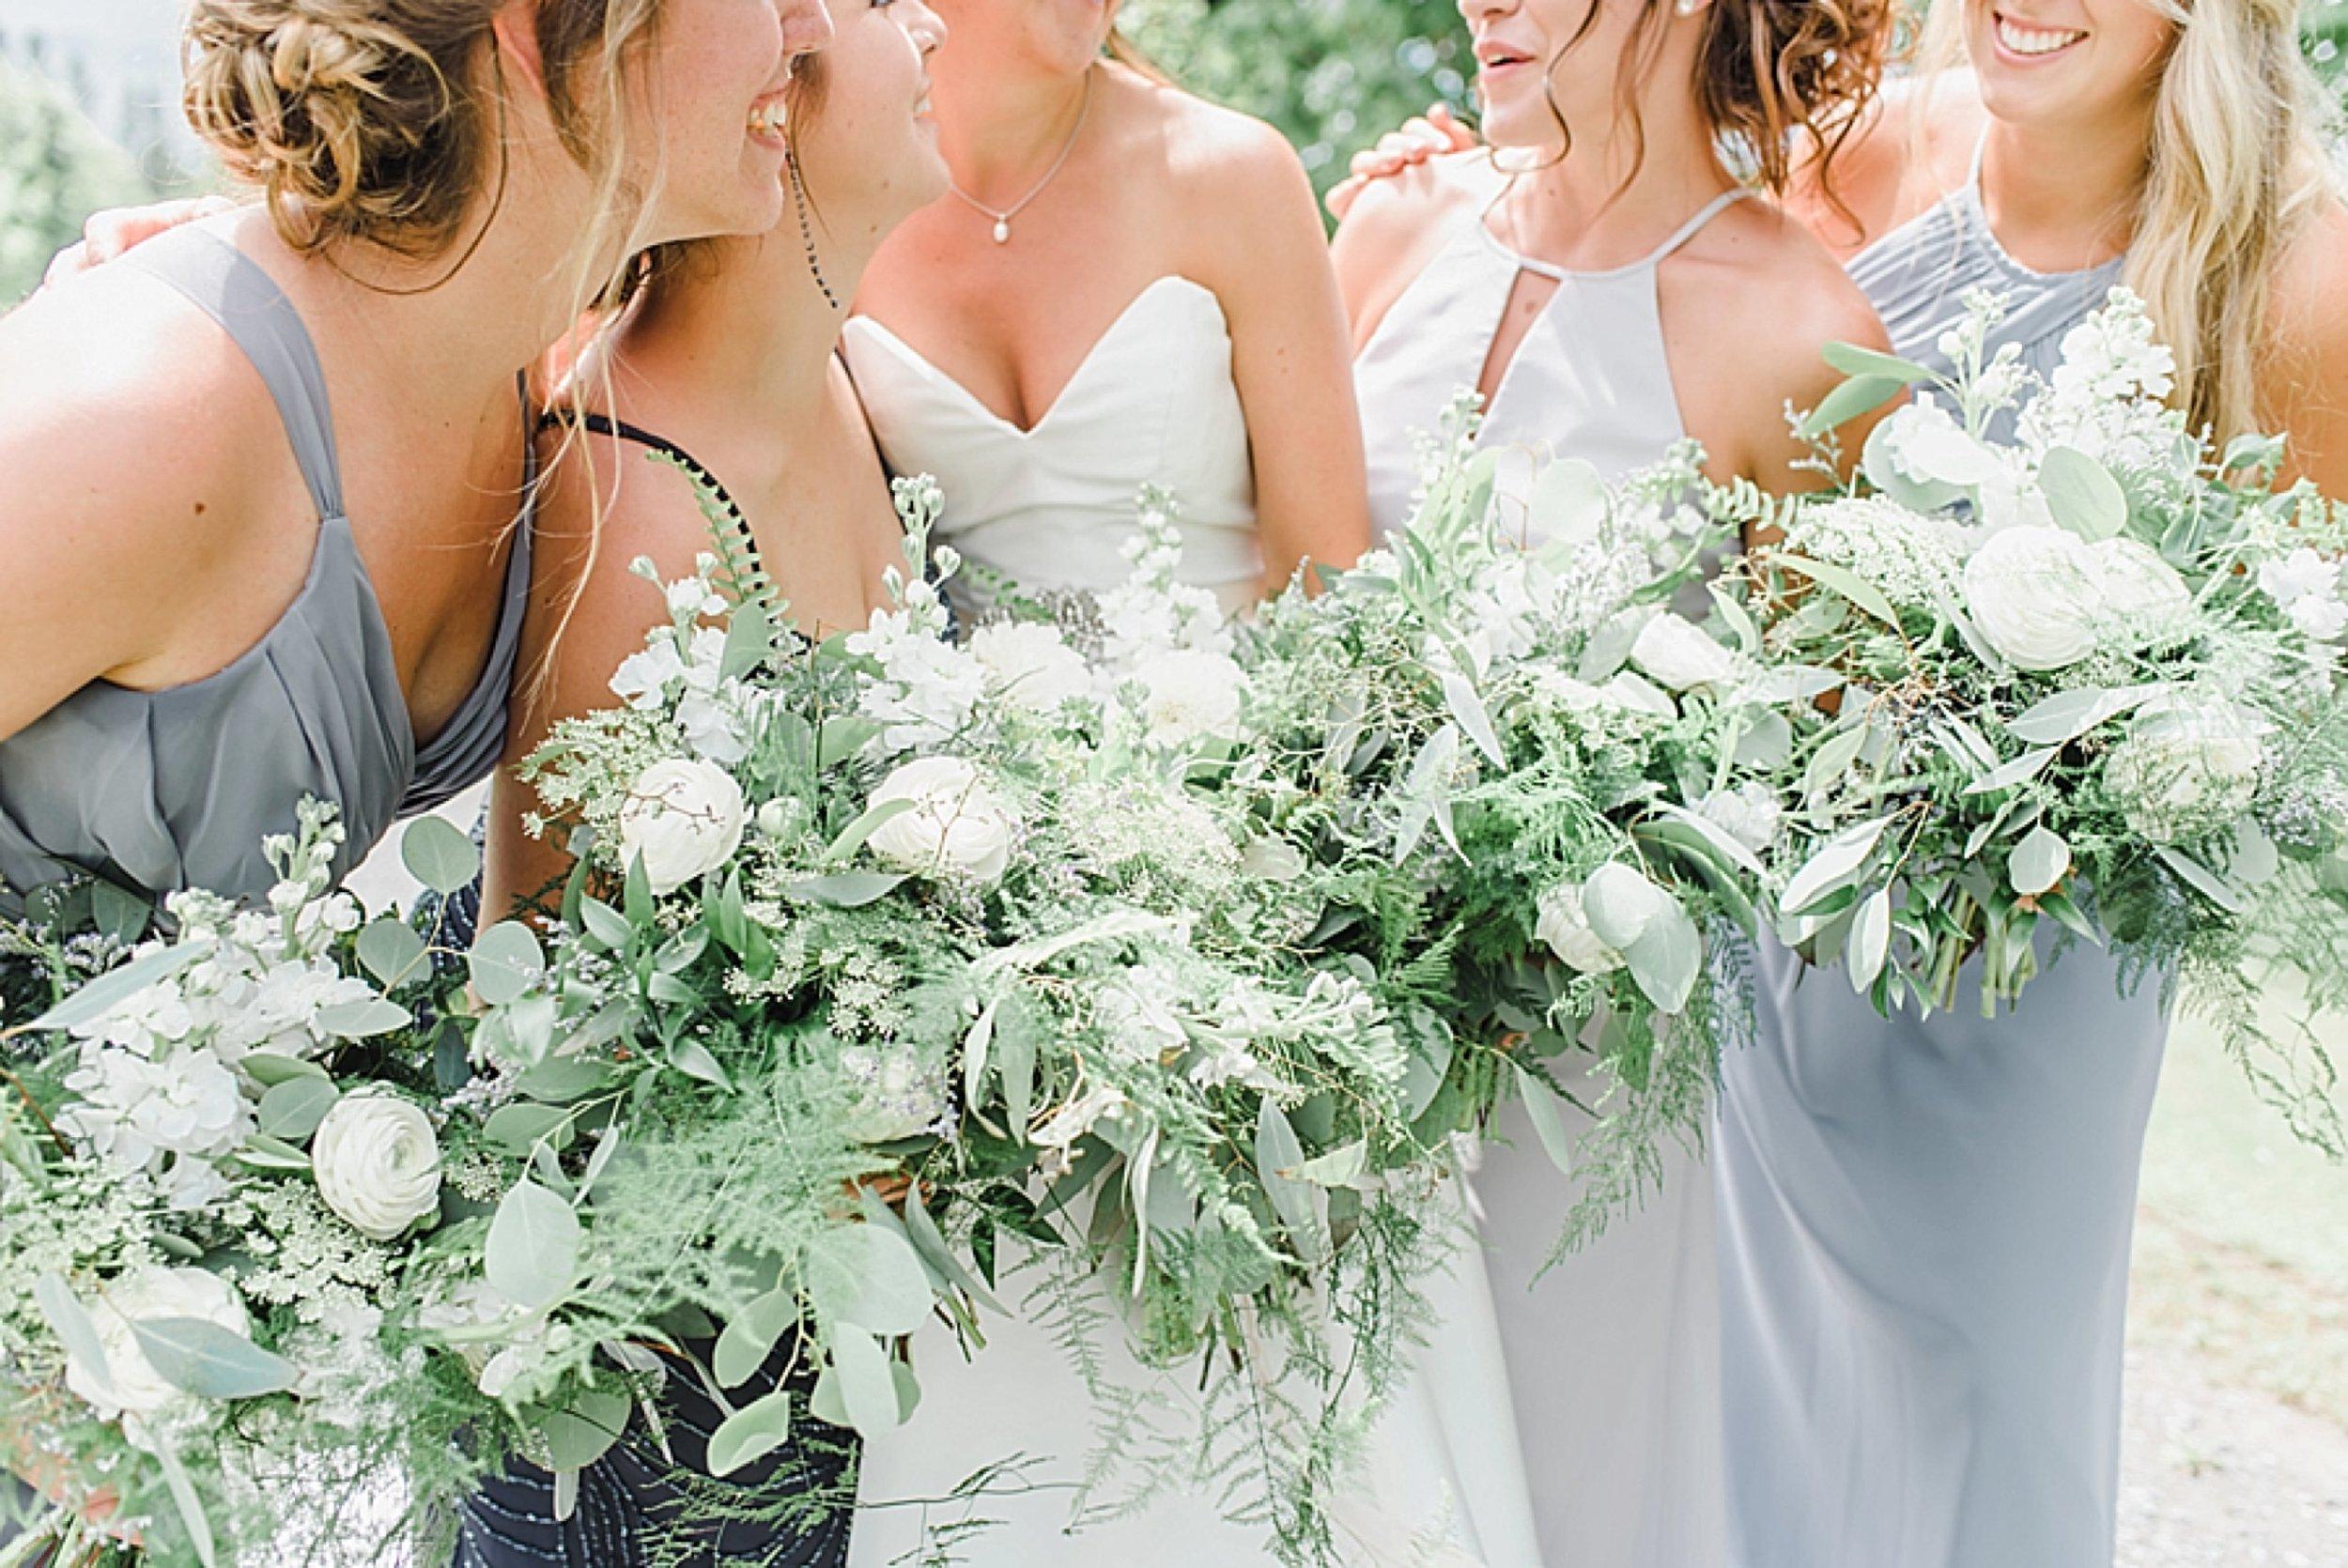 light airy indie fine art ottawa wedding photographer | Ali and Batoul Photography_0515.jpg